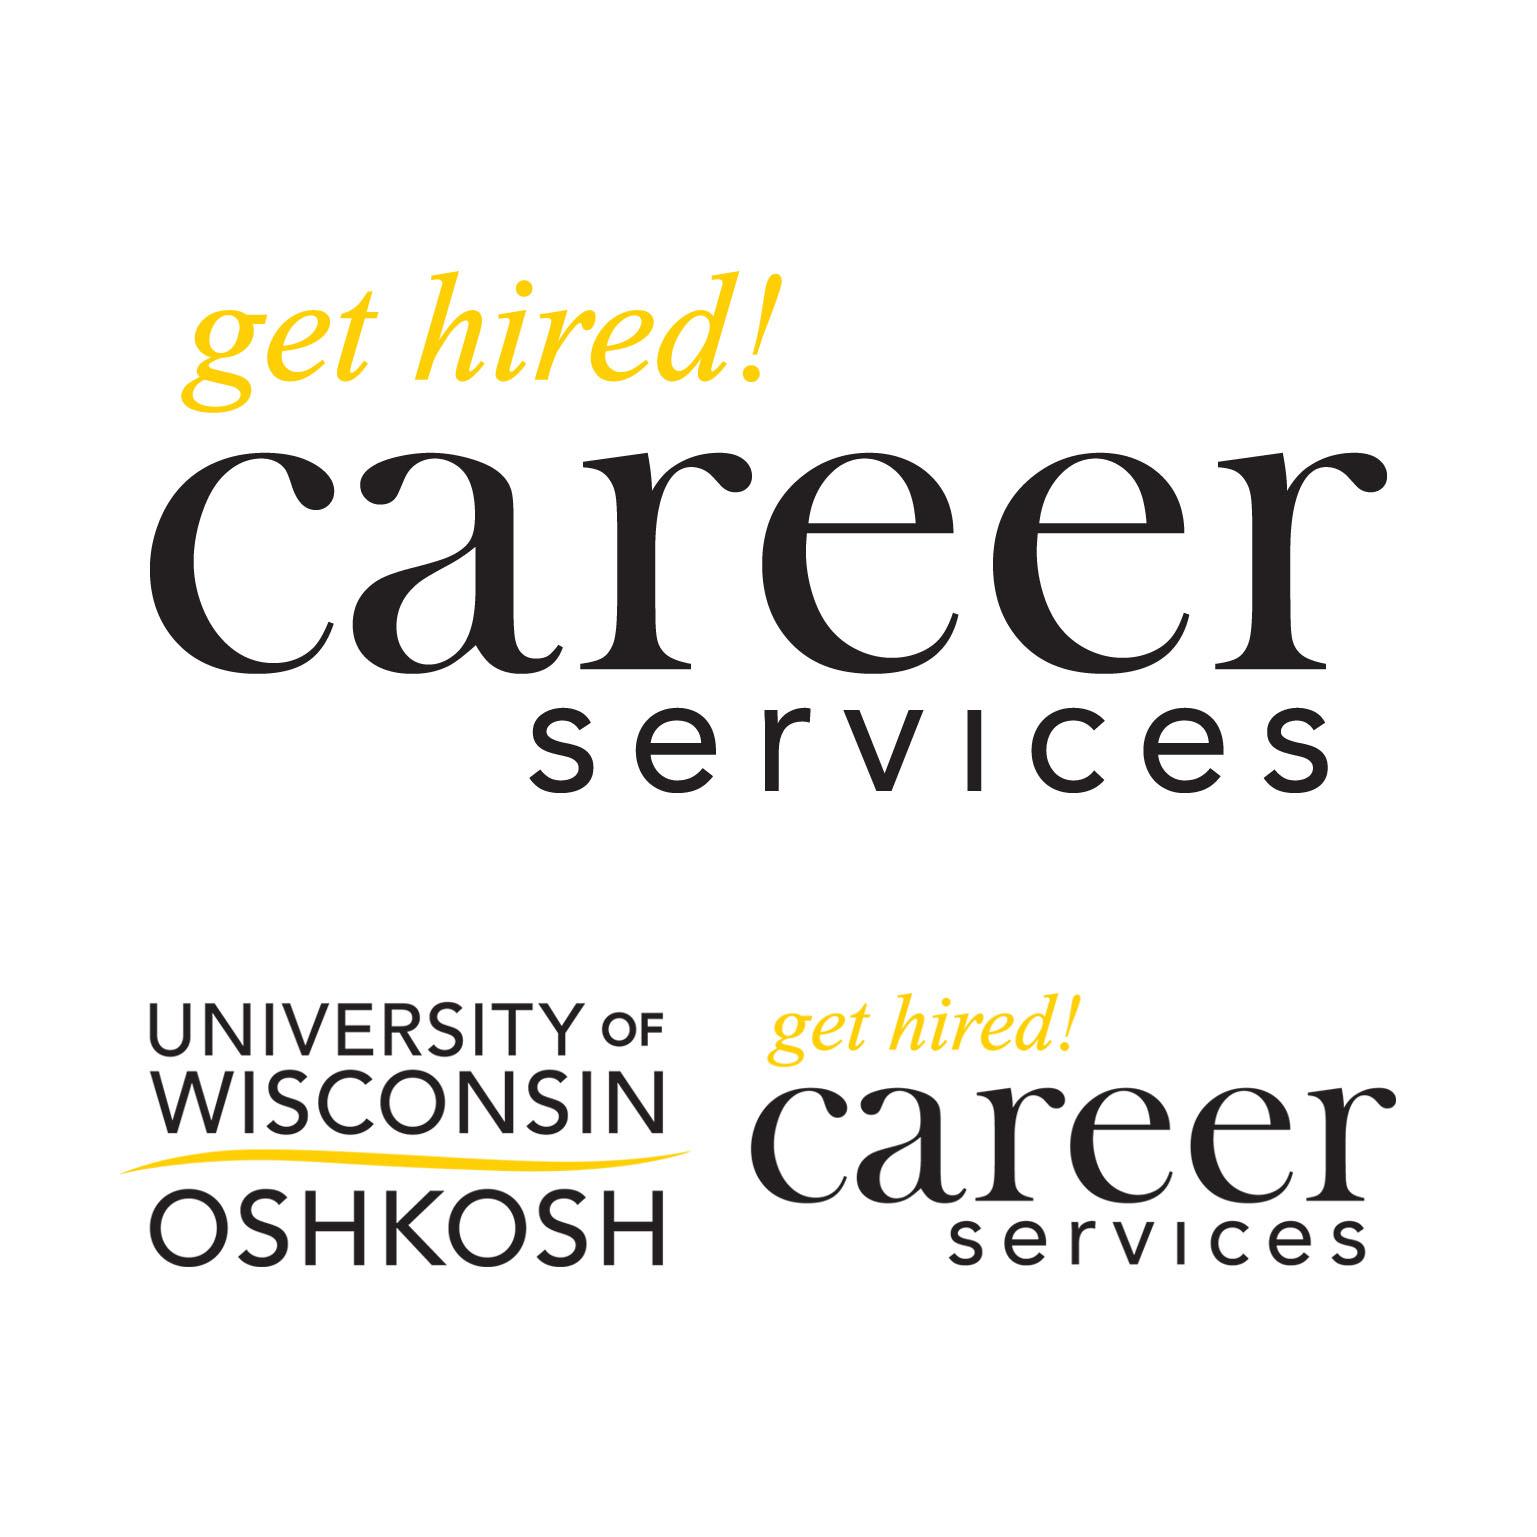 2010 | UW Oshkosh Career Services | logo (not UW Oshkosh portion)